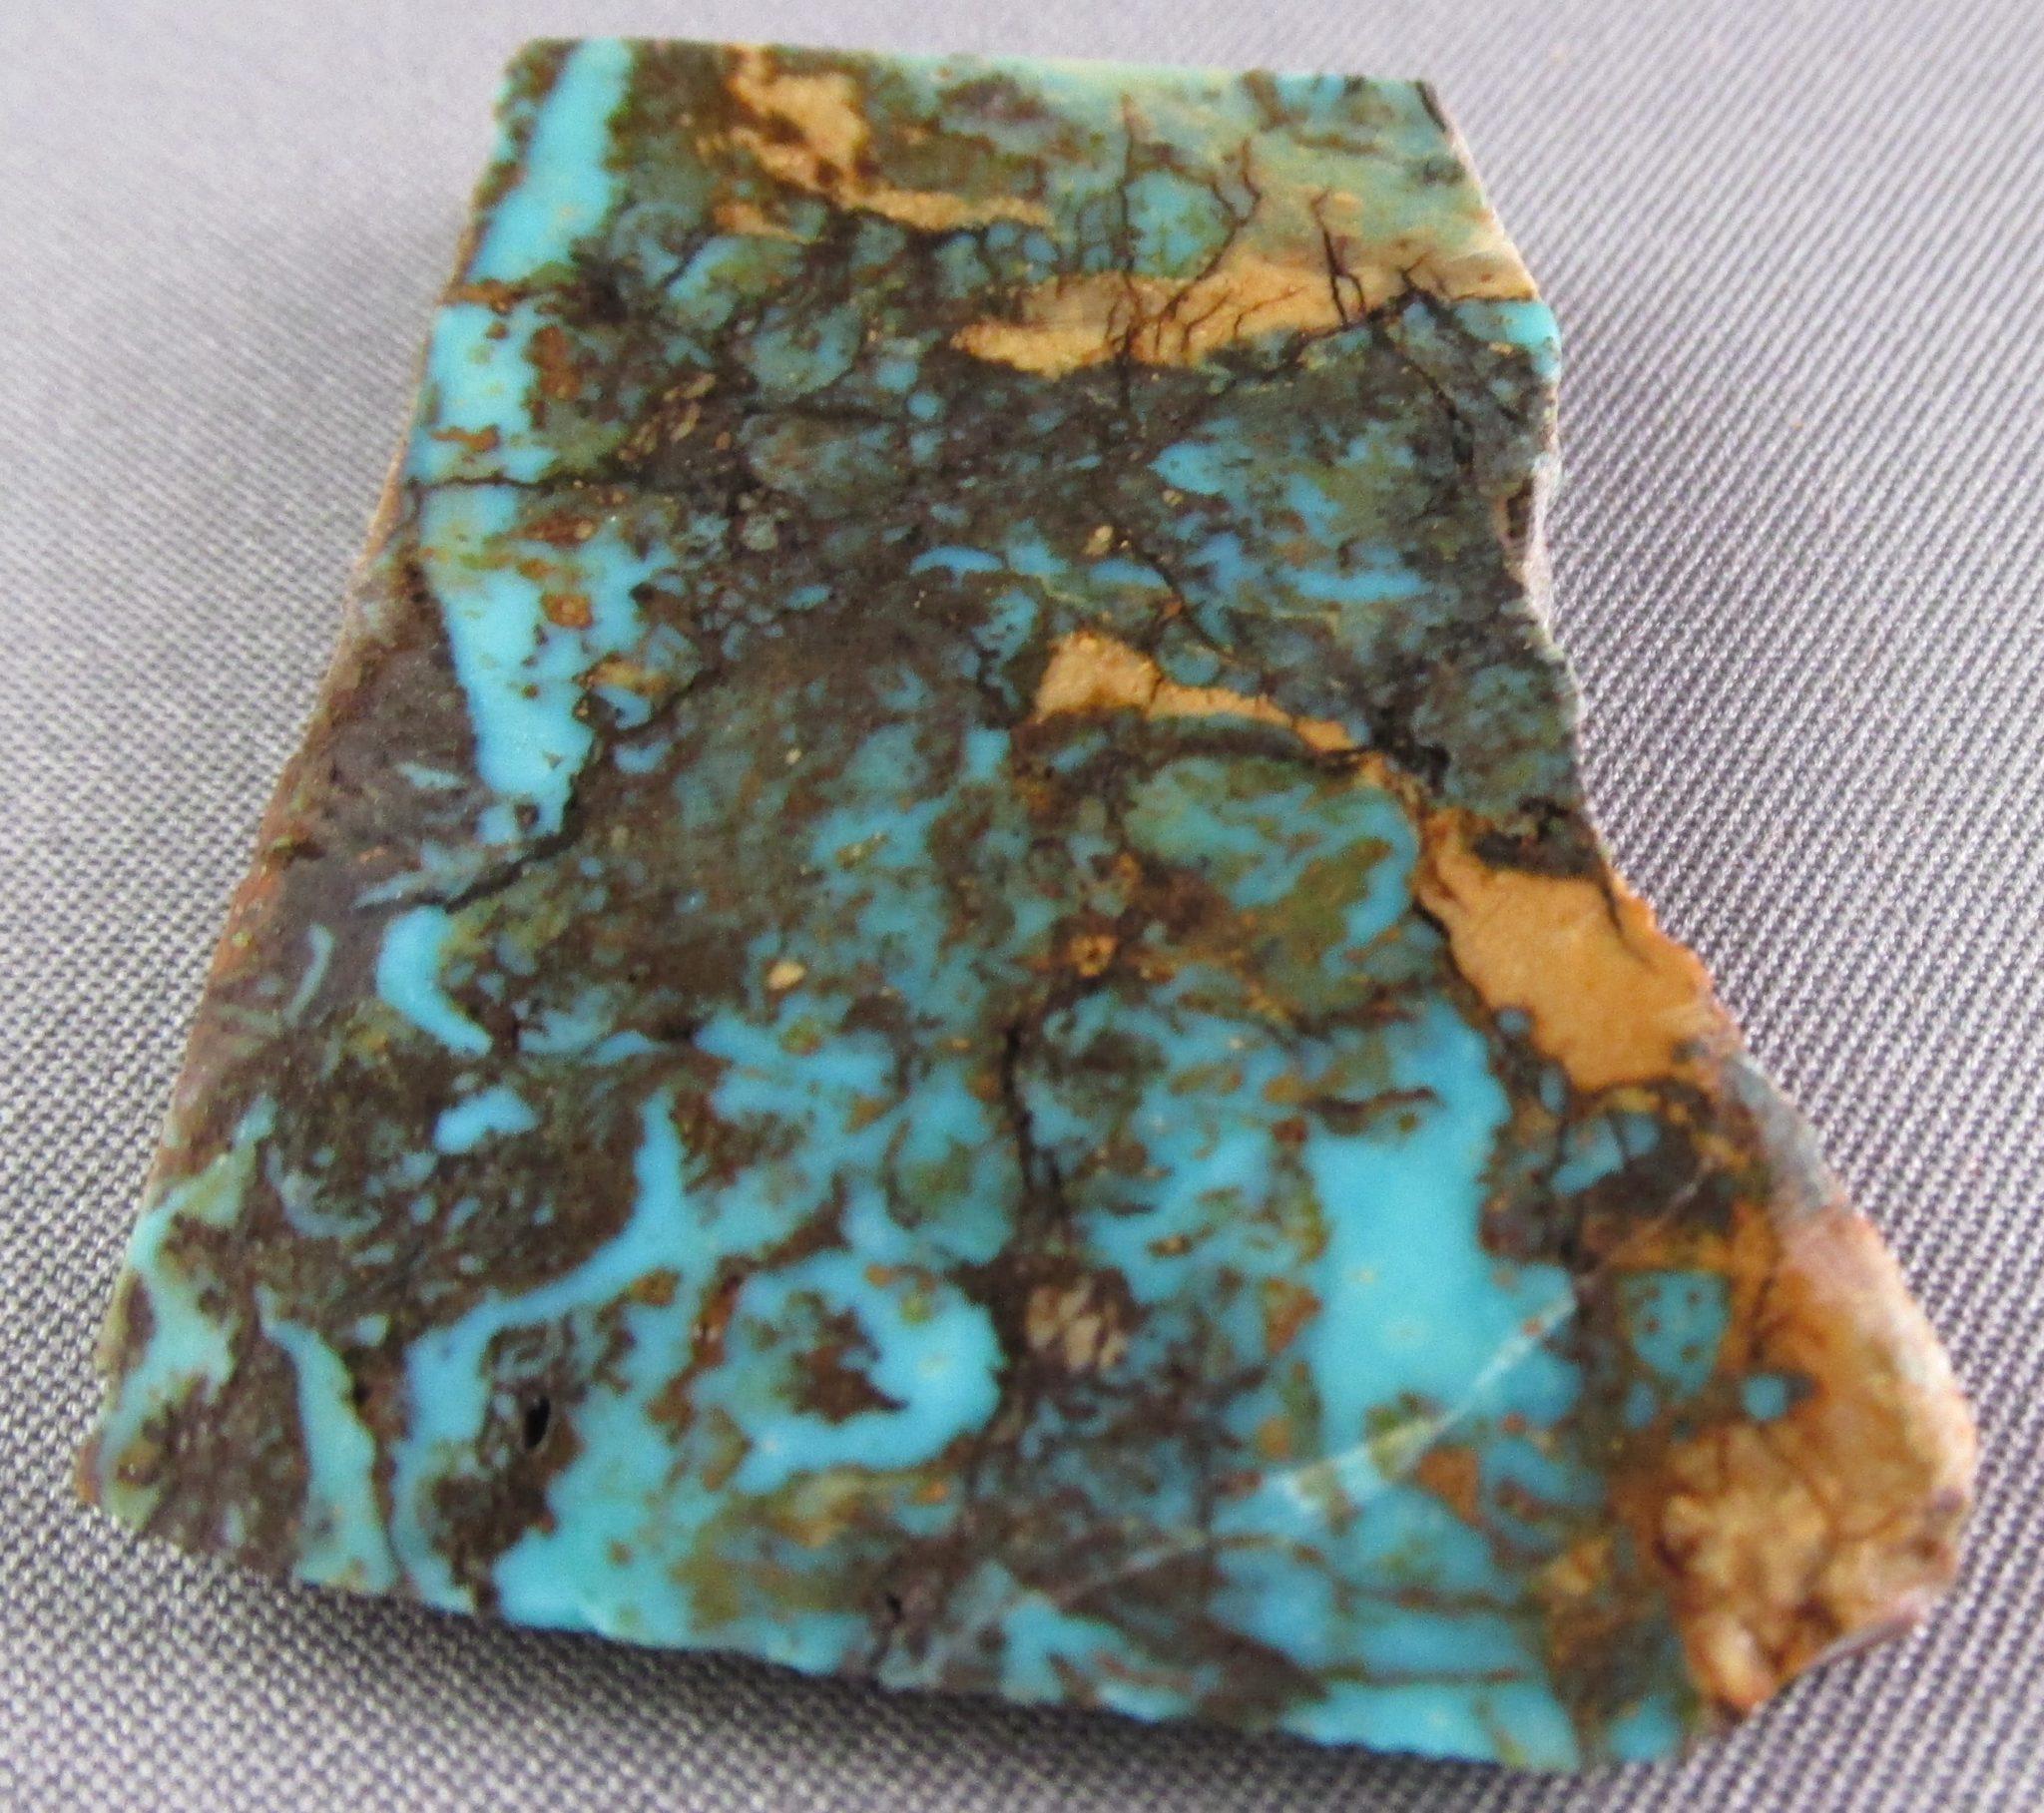 Turquoise Mountain Turquoise from Kingman